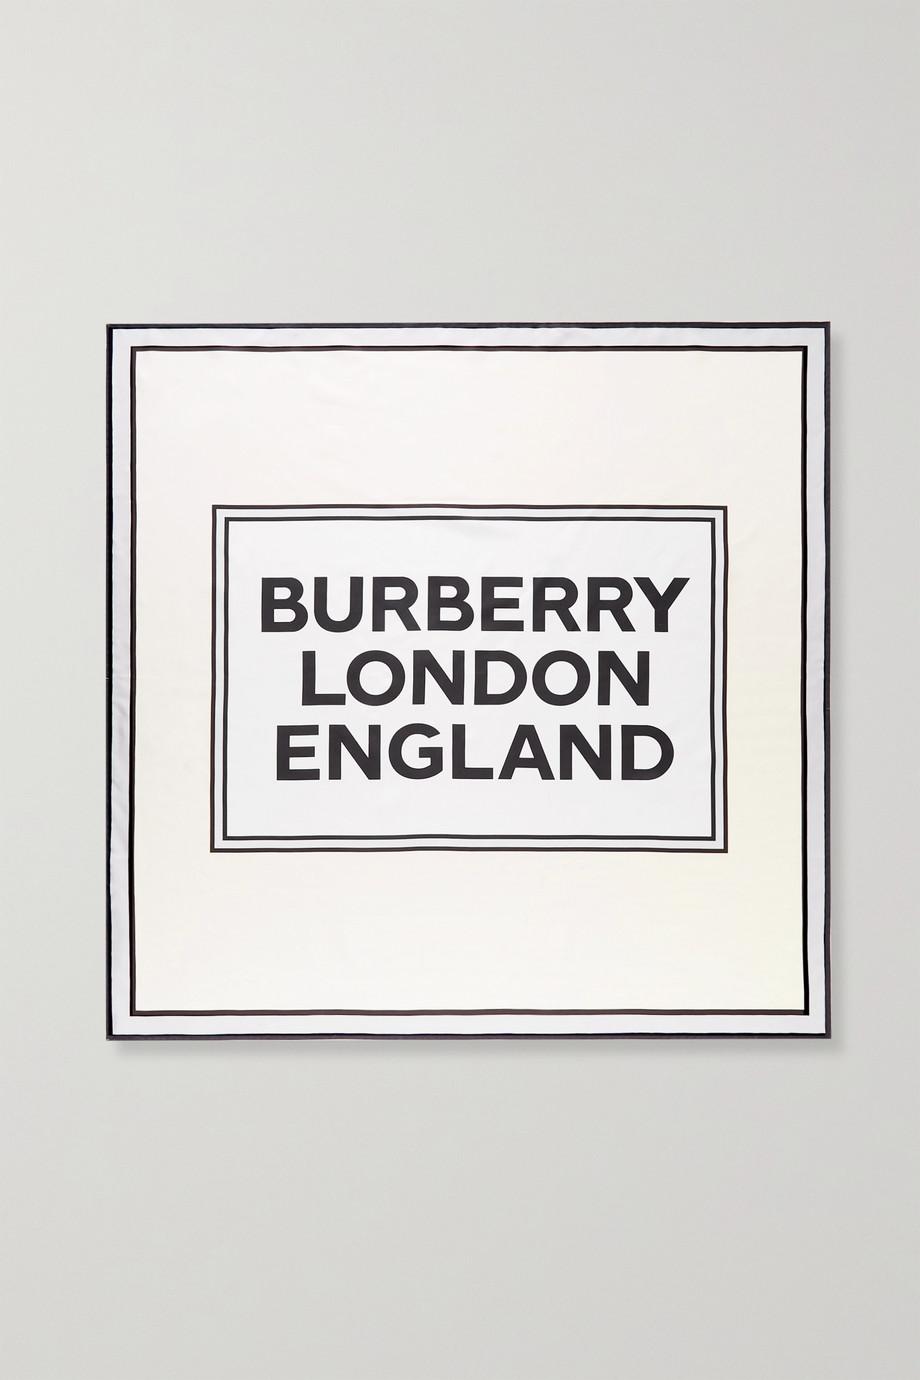 Burberry Bedrucktes Tuch aus Seiden-Twill